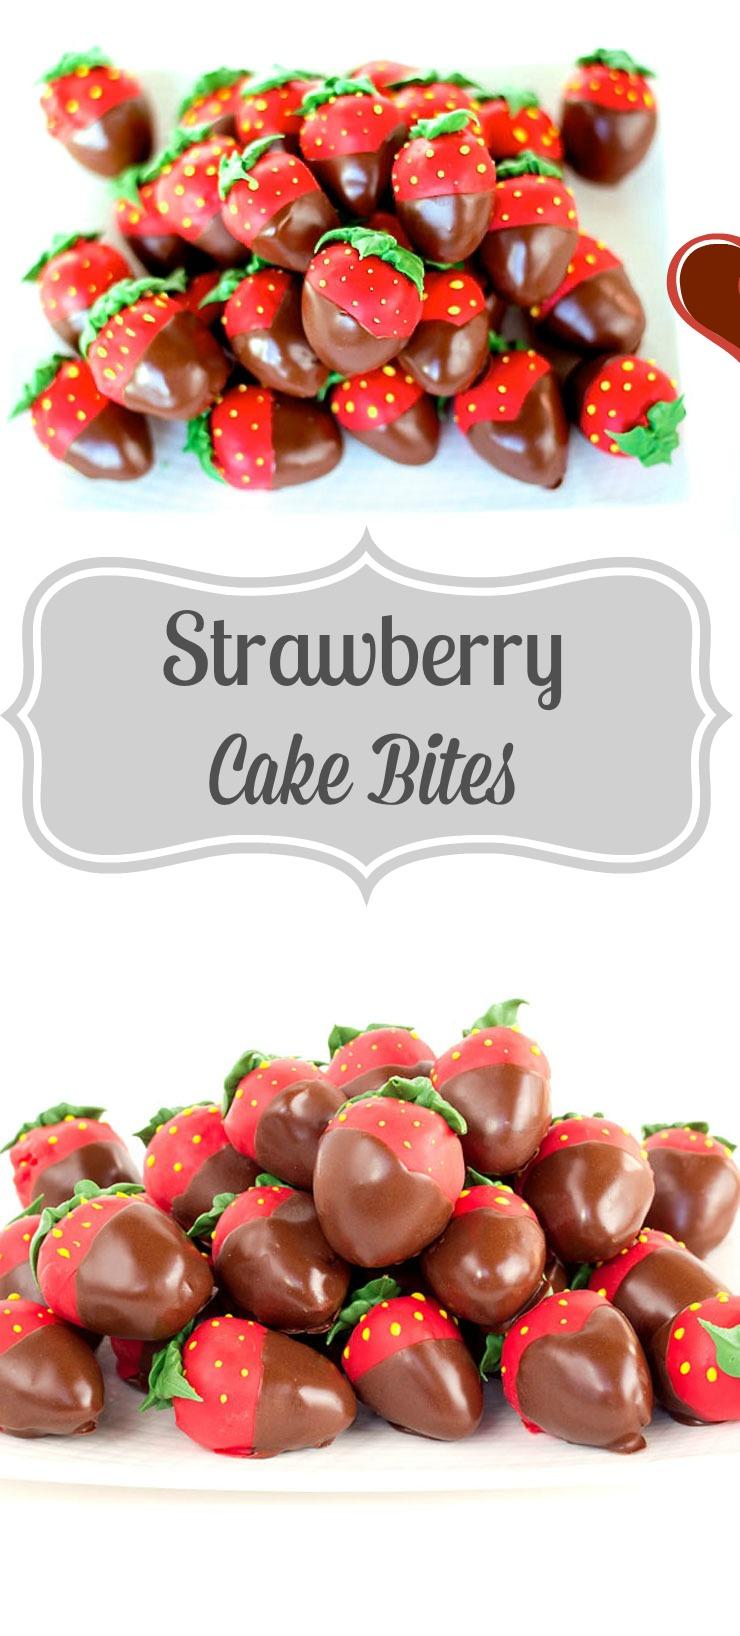 Strawberry-Cake-Bites-by-www.thebearfootbaker.com